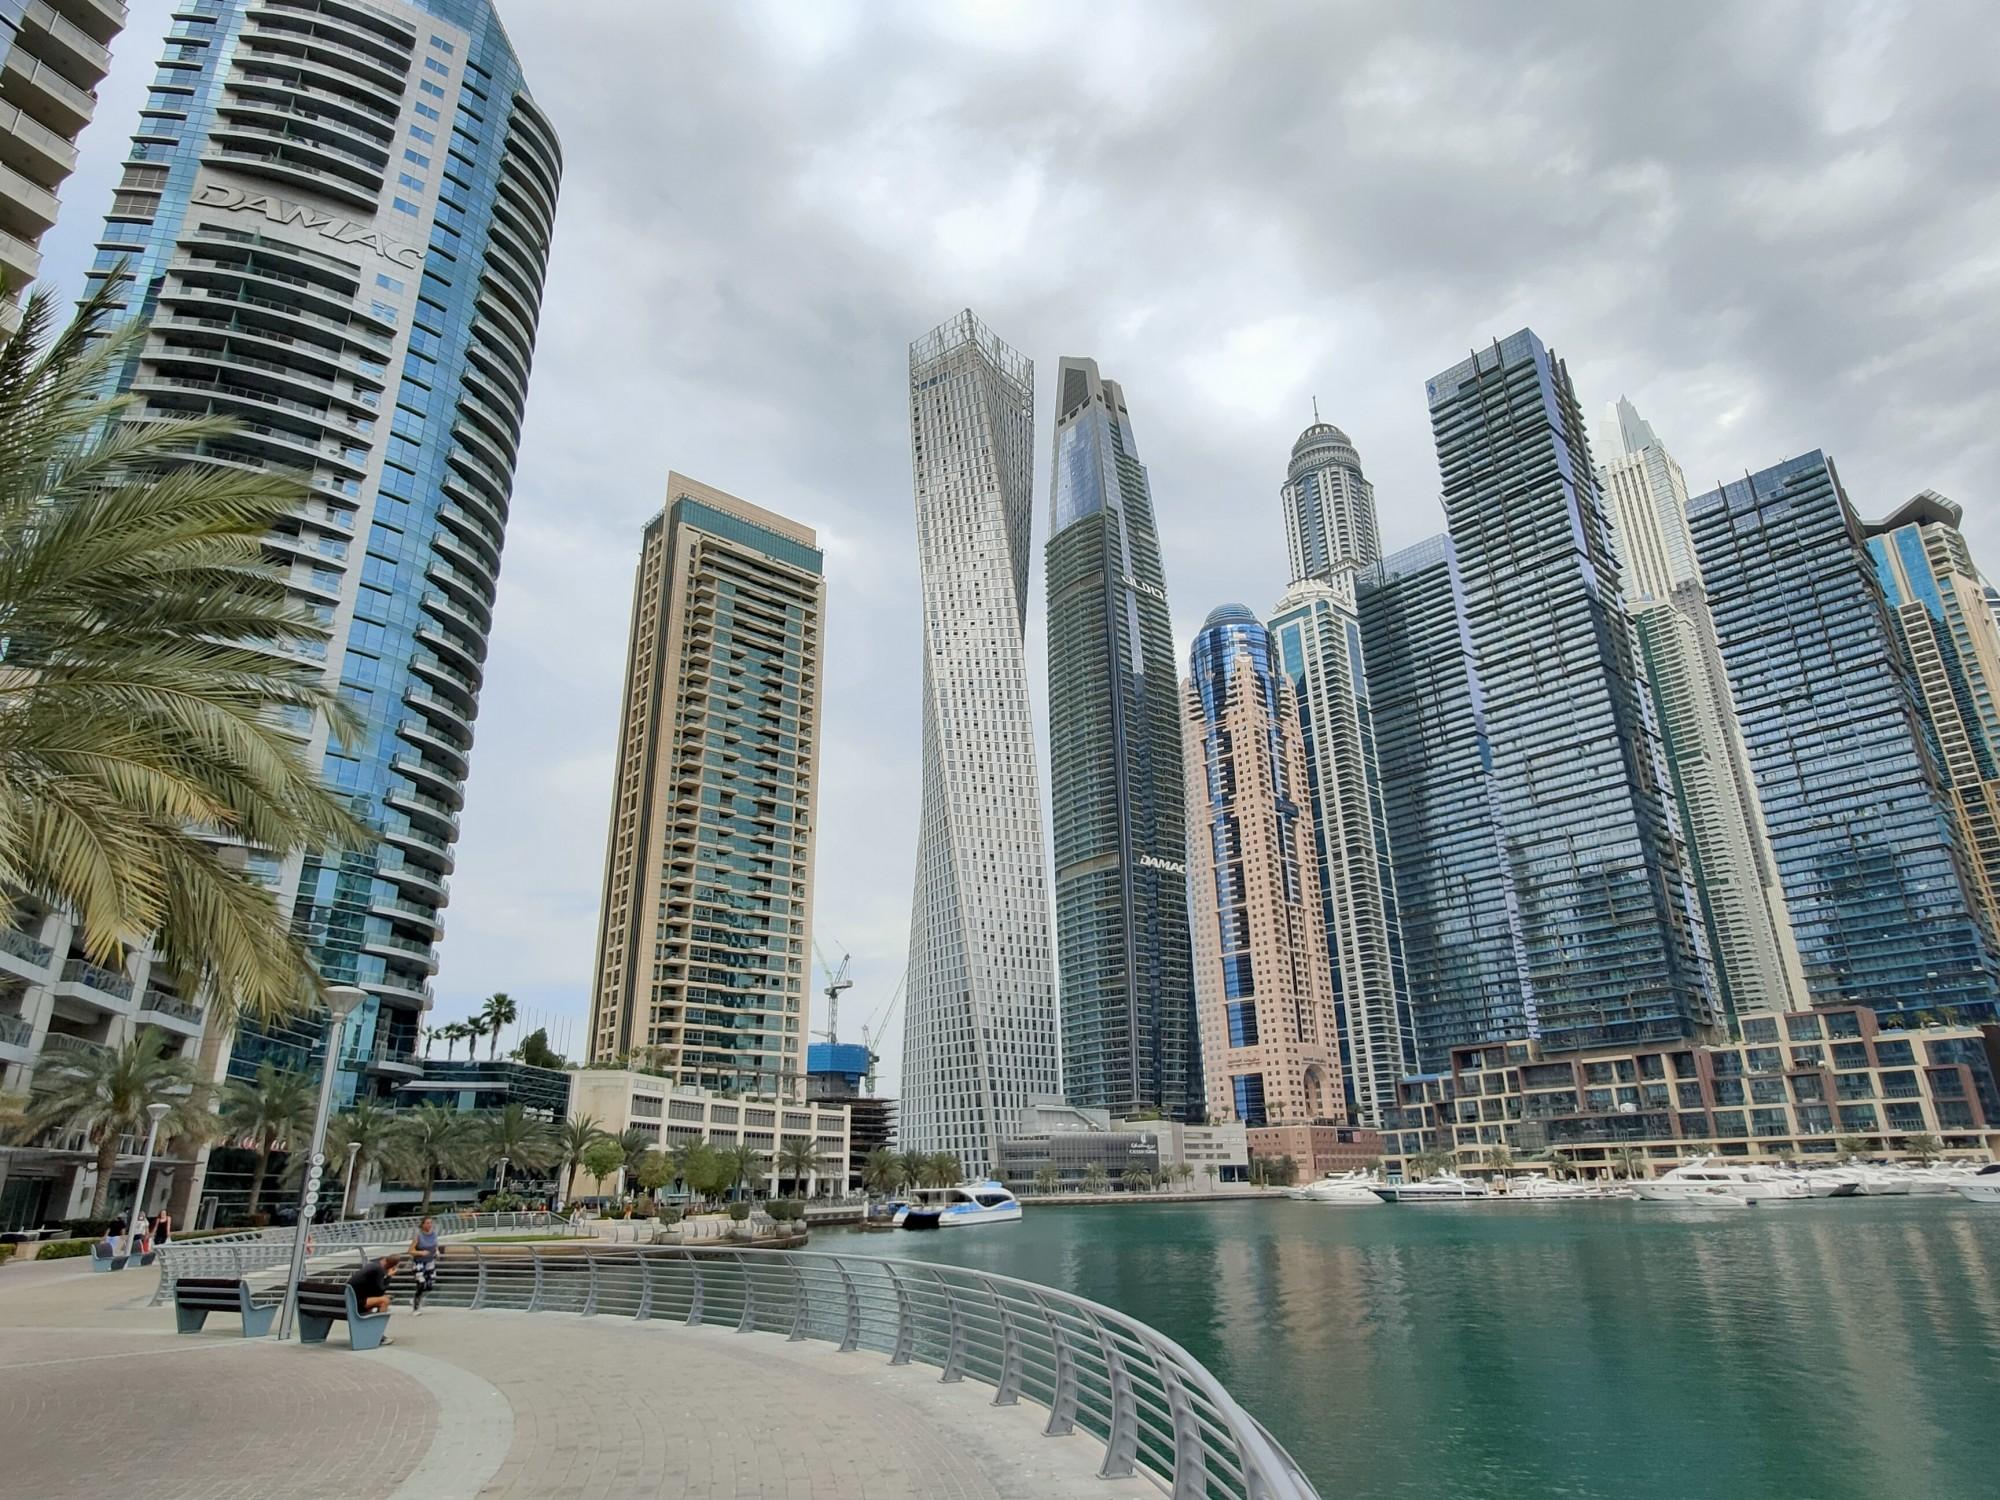 Marina View | All Facilities Free | Both Master 2BR Apartment | Marina Dubai. . .